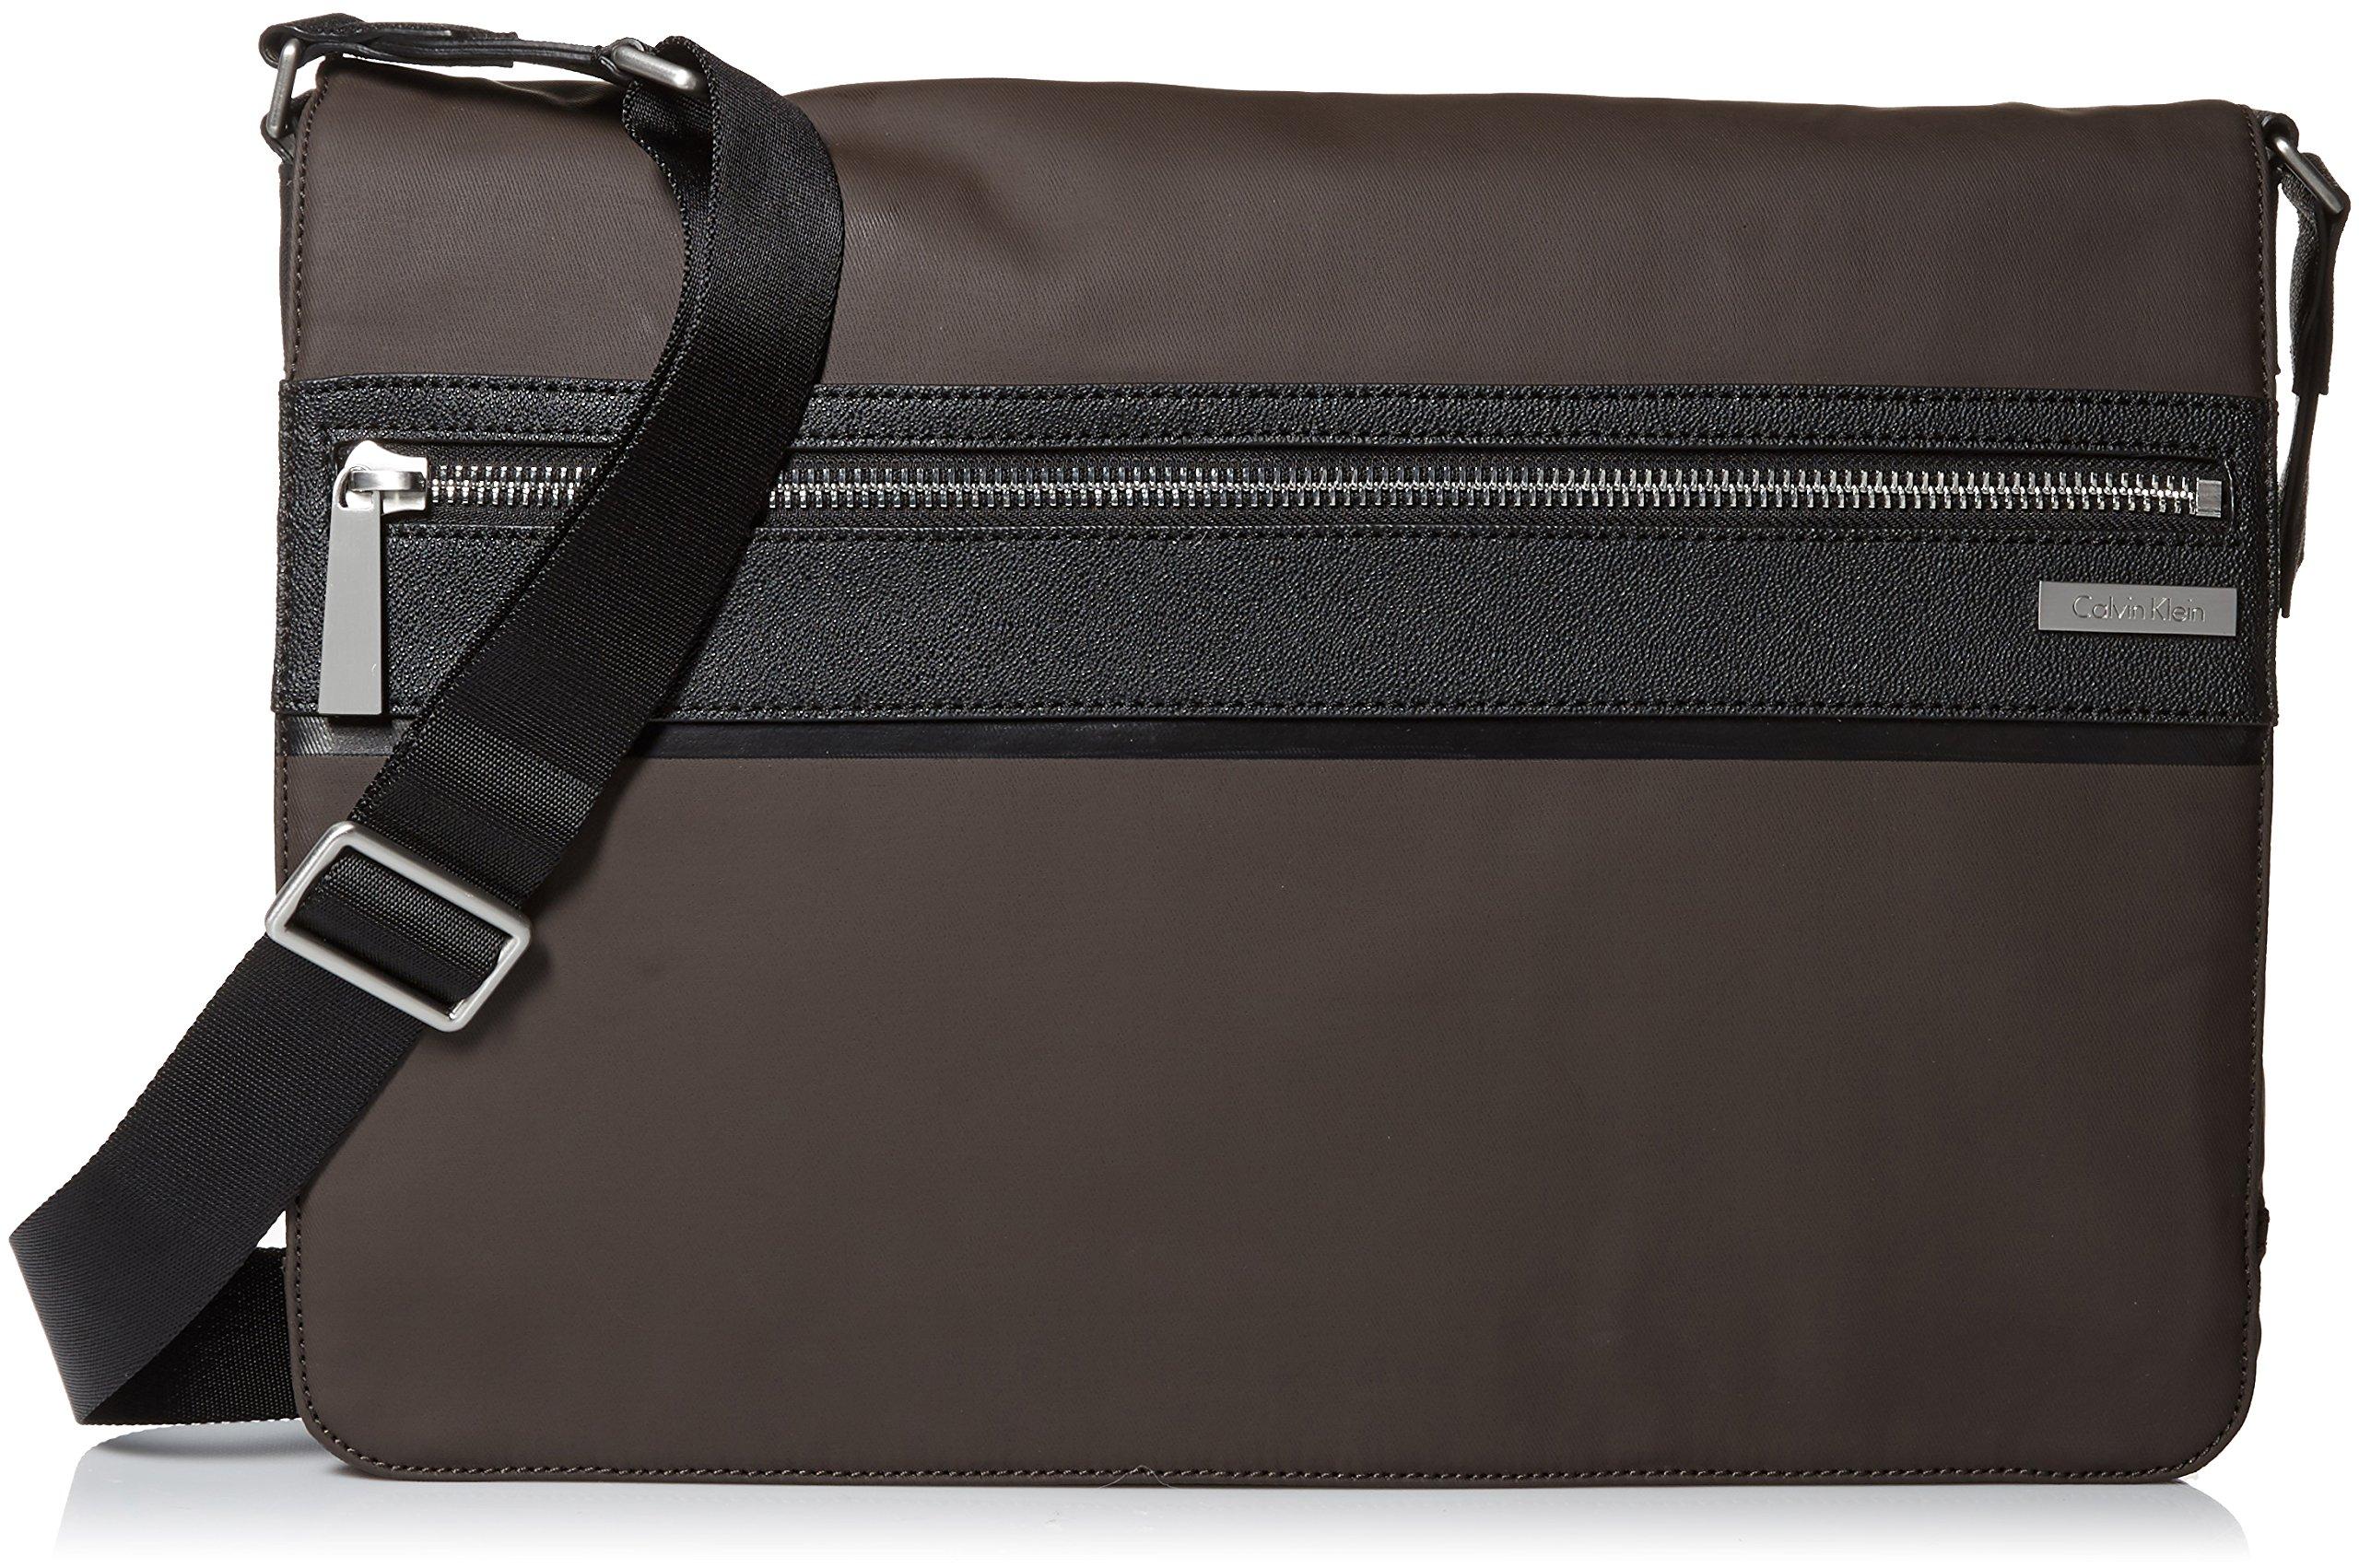 Calvin Klein Men's Coated Nylon with Saffiano Trim Messenger, Dark Chocolate Brown